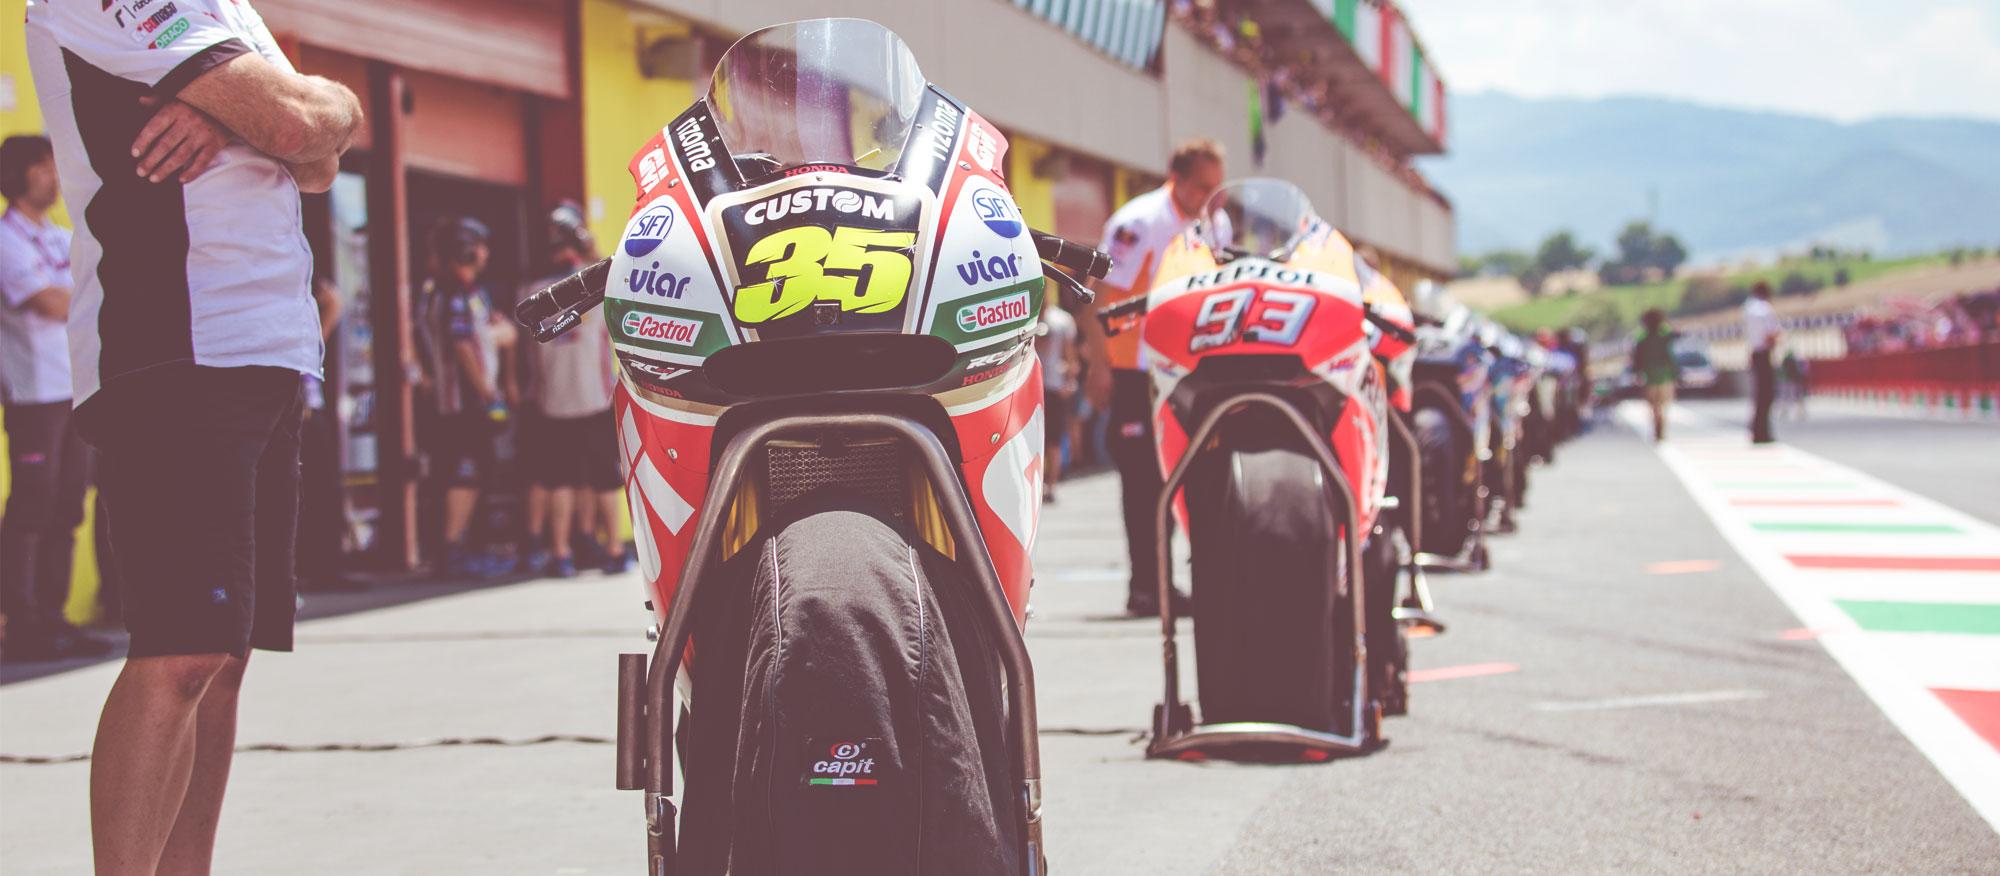 MotoGP Misano, la febbre del tutto esaurito